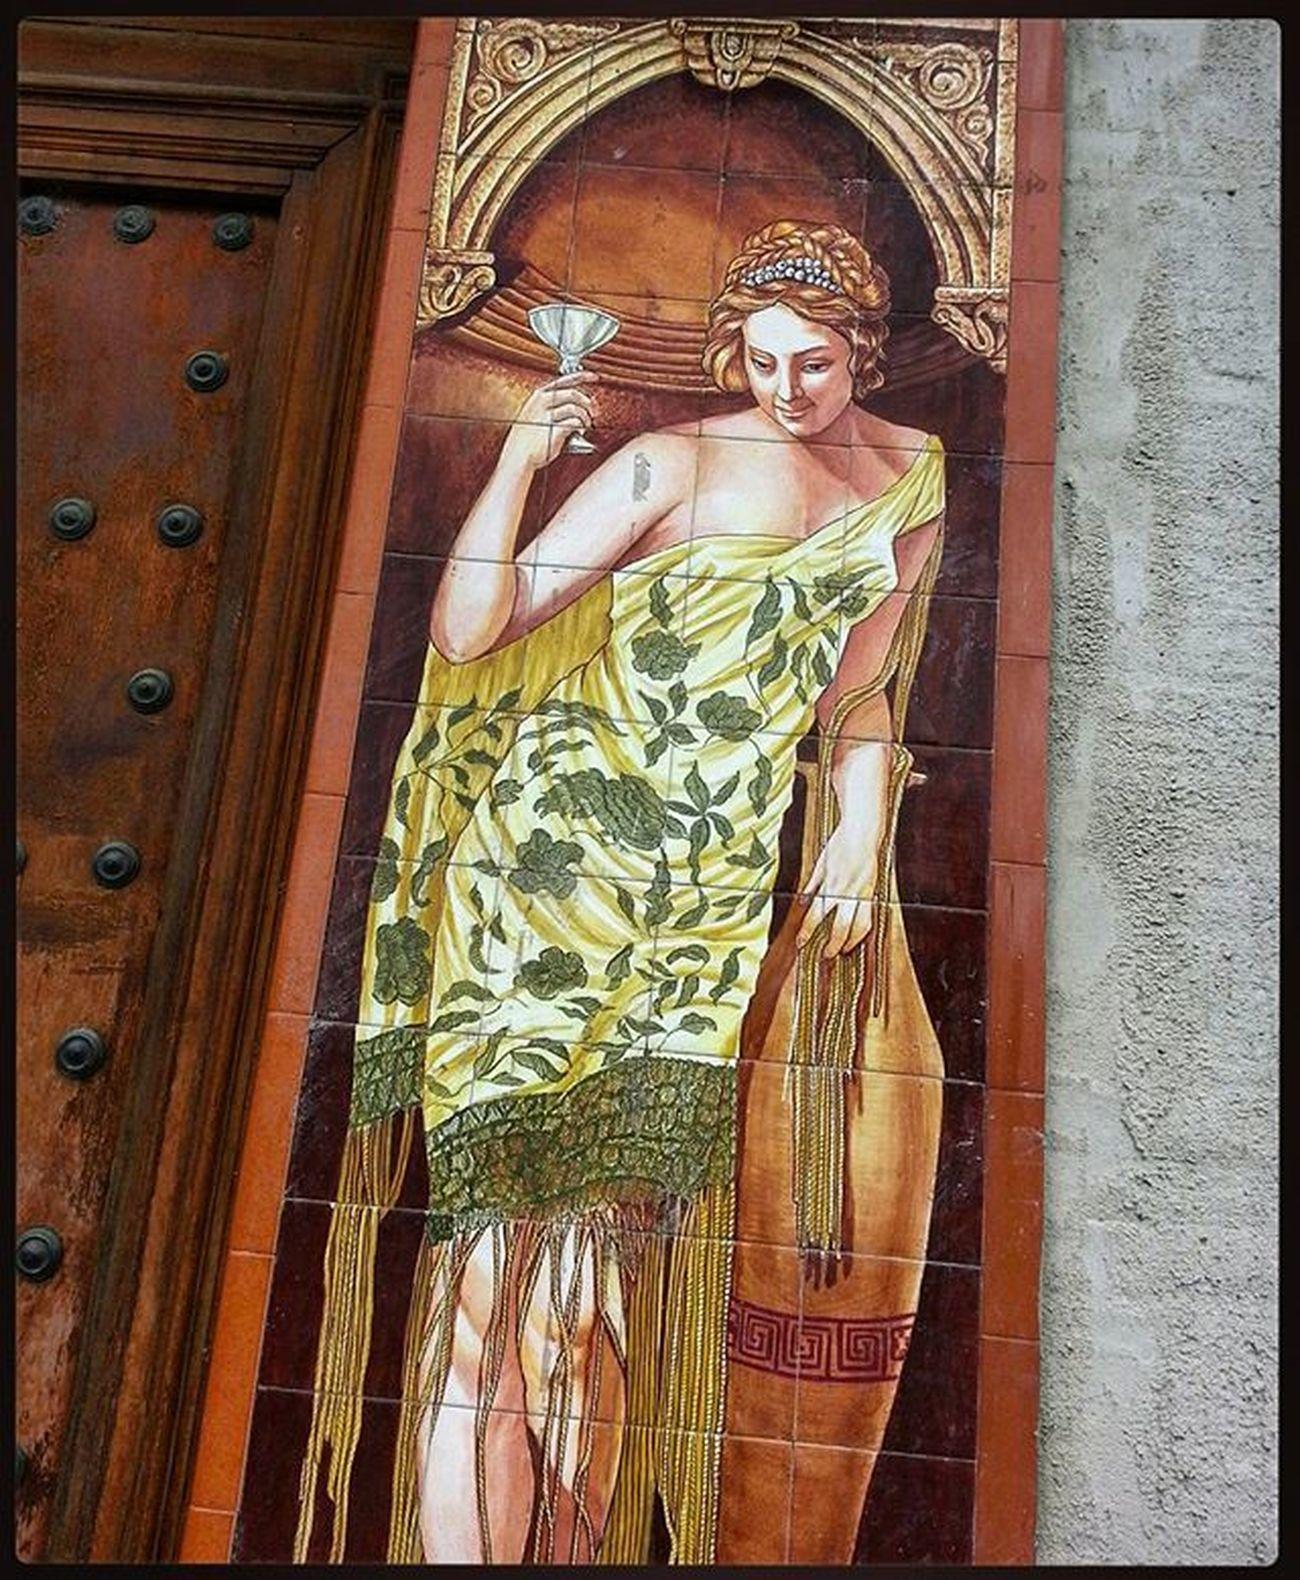 Ig_europe Ig_spain IG_andalucia España Andalucía Sevilla Triana Ig_Sevilla Azulejos Loves_details Loves_doorsandco Filthyfacades Facades Detalhes_em_foco Arte DetallesDeLaCiudad Estaes_andalucia Estaes_sevilla  Loves_spain Loves_sevilla Loves_Andalucia Andaluciaviva Oleandalucia Испания Андалусия Севилья Триана Triana, Sevilla.